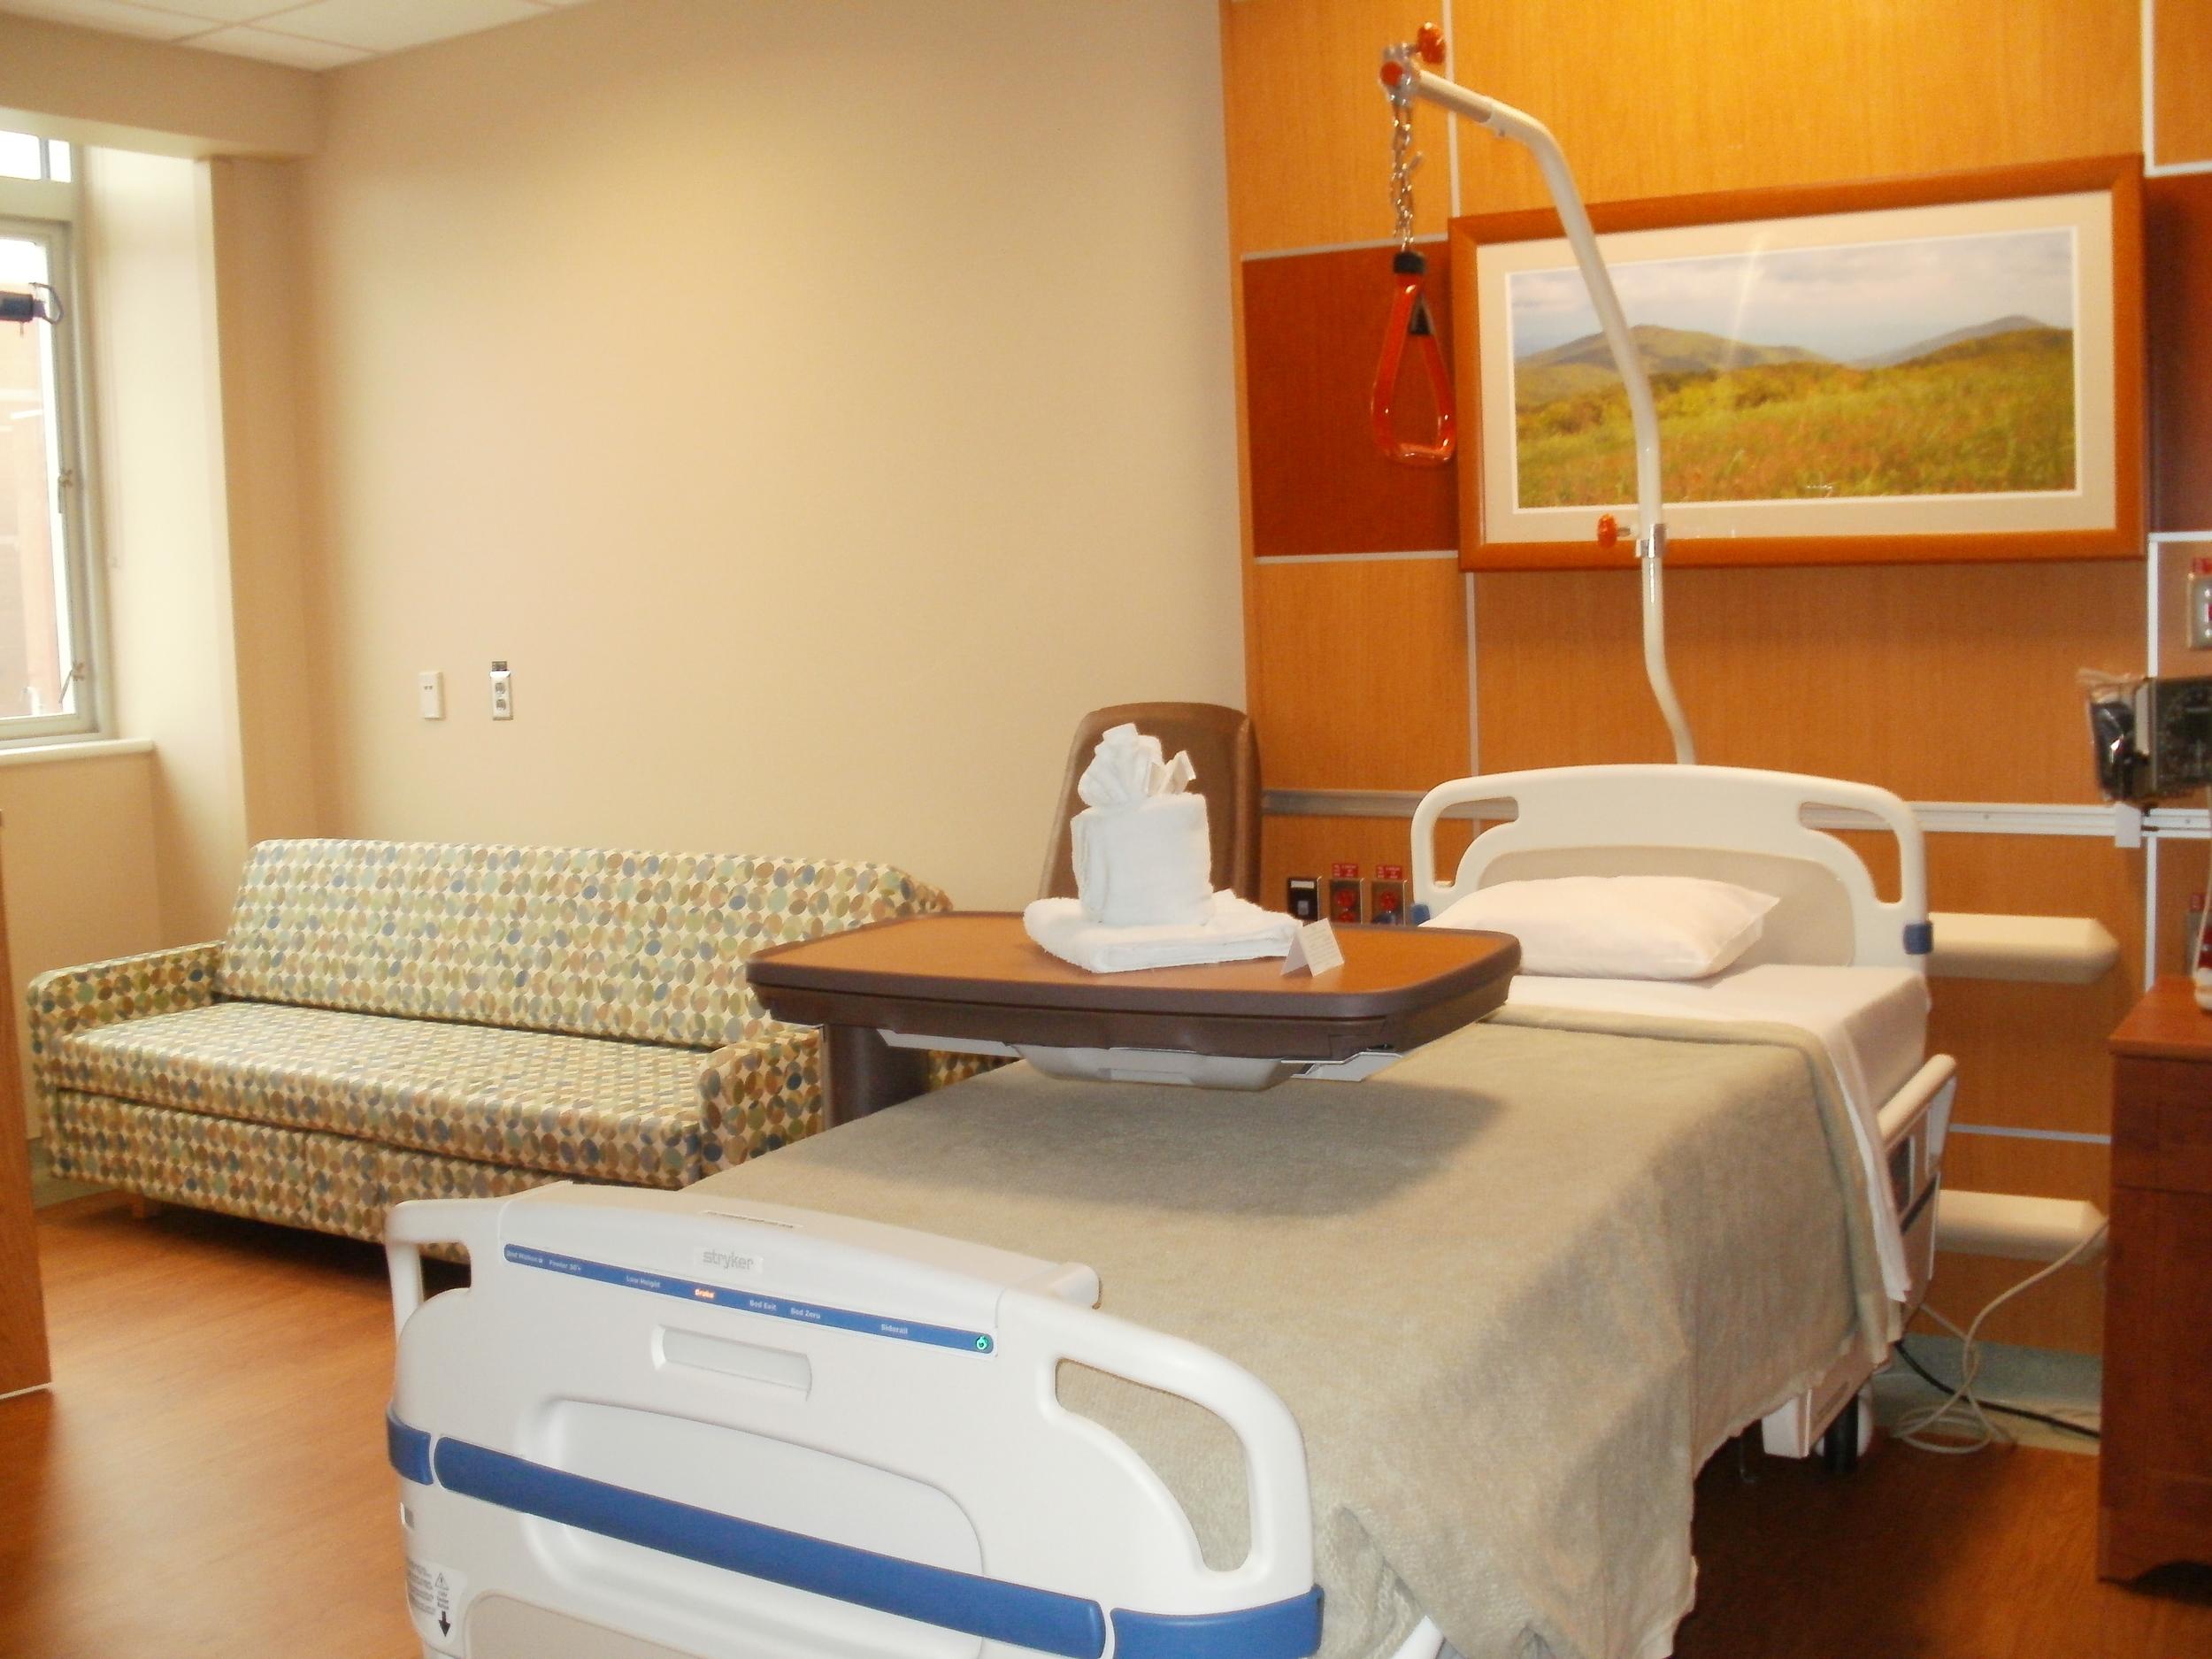 Trauma Patient Room